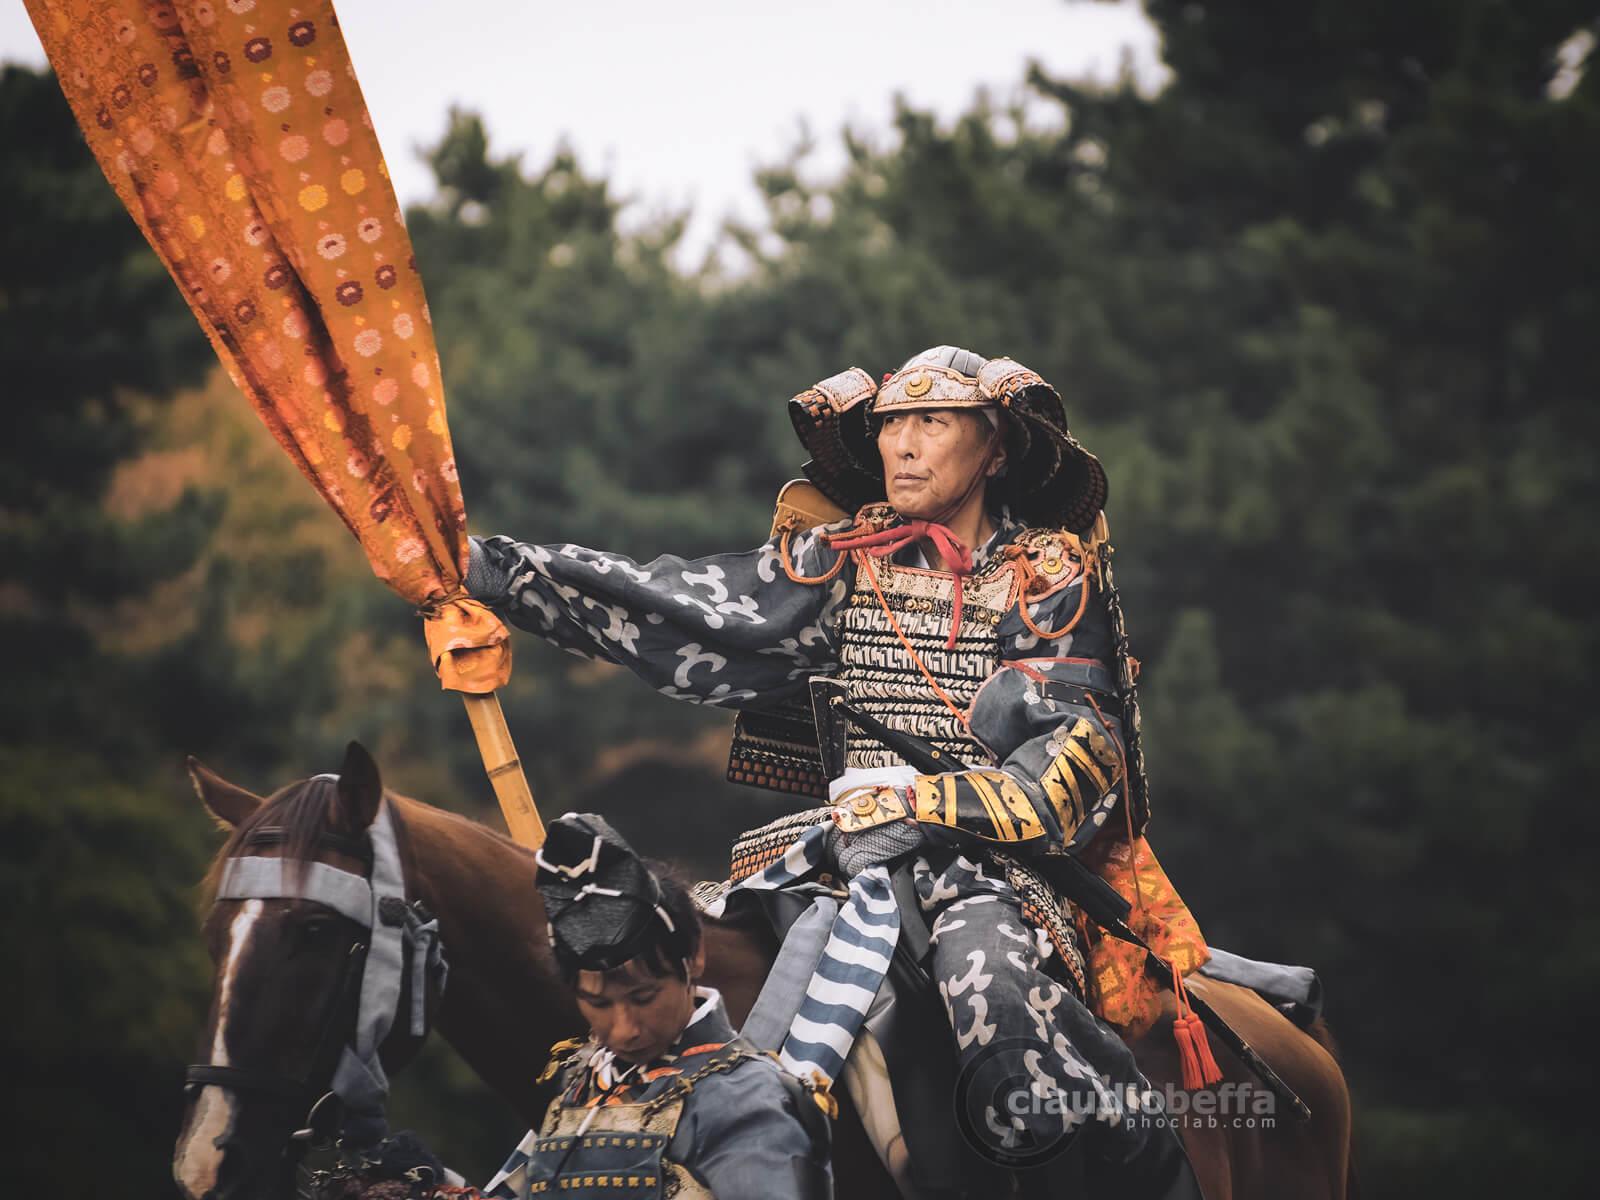 Flag officer of Kusunoki Masashige. Samurai, Yoroi, Armor, Kabuto, Helmet, Katana, Flag, Jidai Matsuri, Festival, Kyoto, Japan, History, Tradition, Travel.